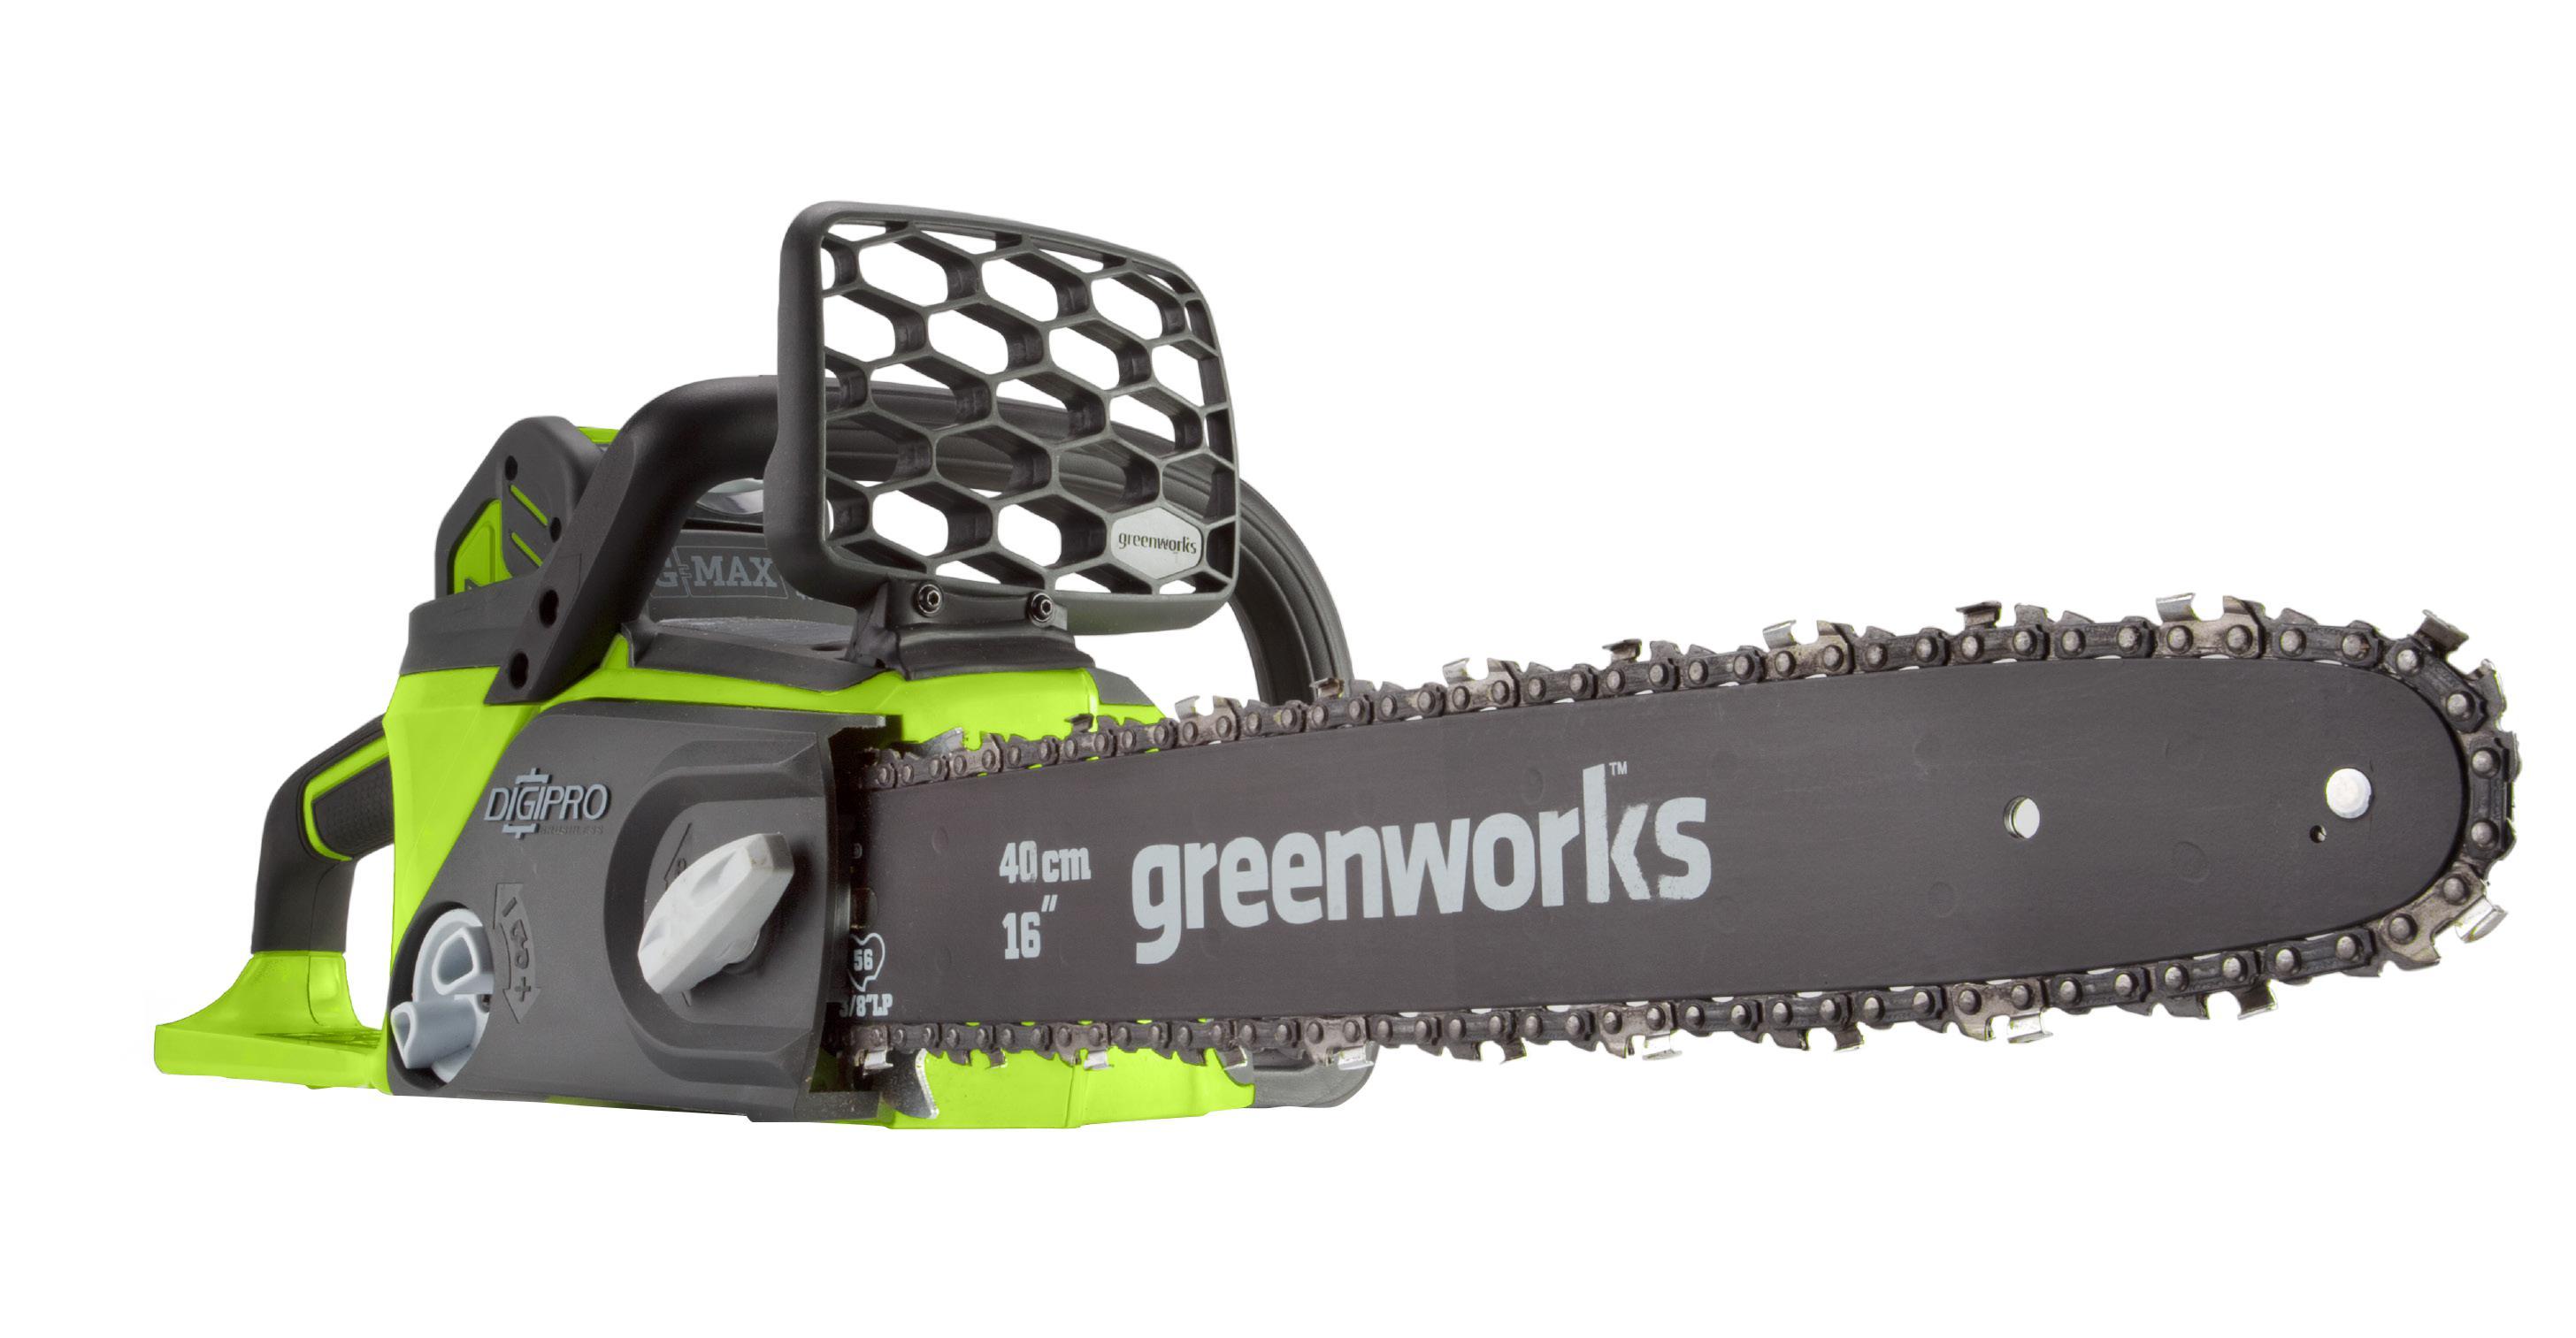 Пила цепная аккумуляторная Greenworks Gd40cs40 (20077) БЕЗ АККУМ и ЗУ